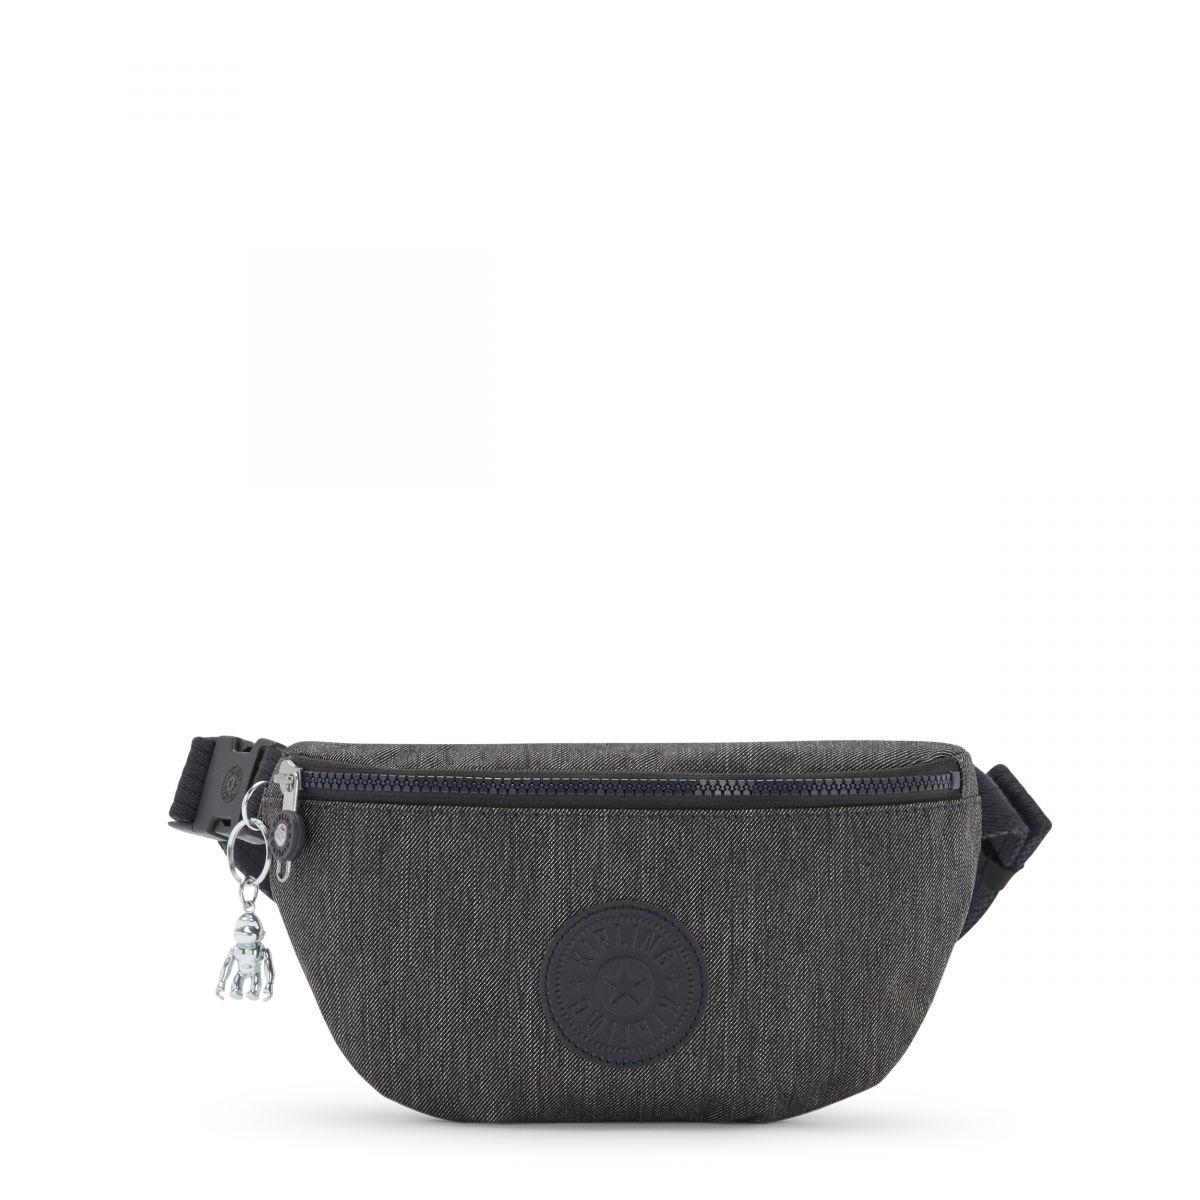 NEW FRESH BAGS by Kipling